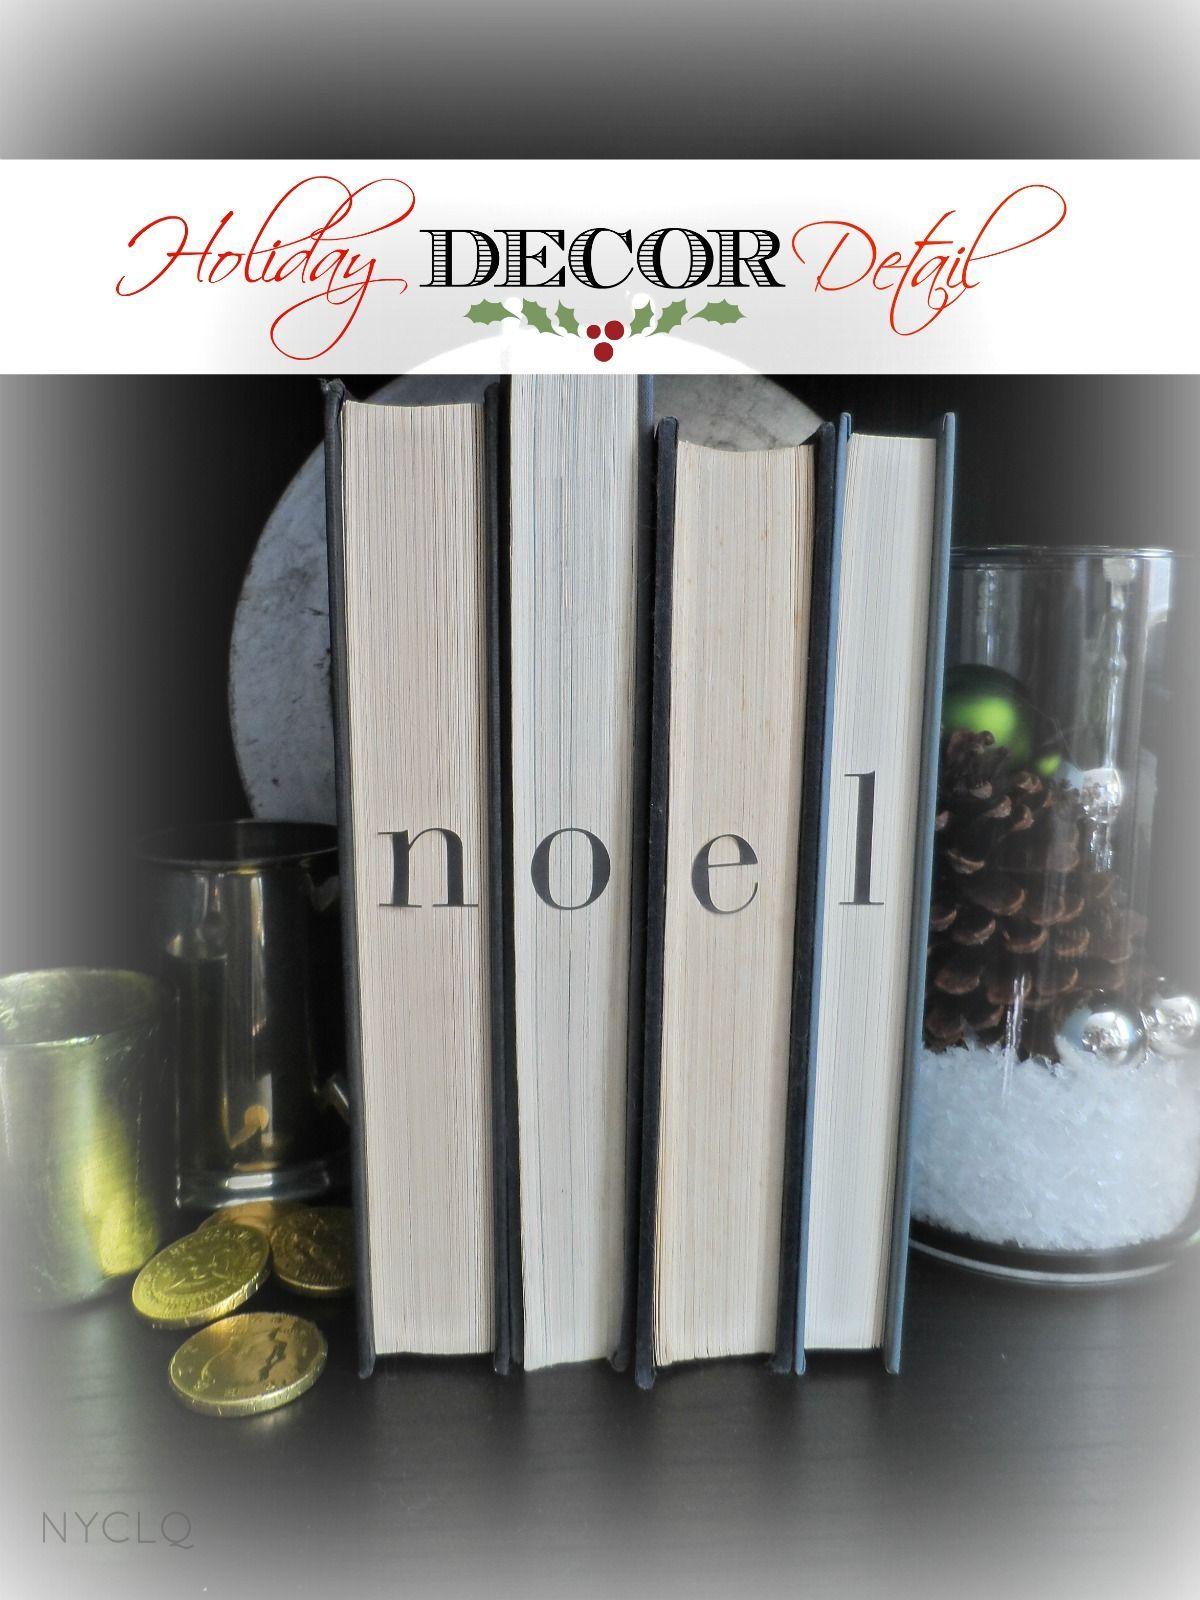 EZ DIY - BOOKSHELF DECOR DETAIL -  EZ DIY – BOOKSHELF DECOR DETAIL via @FocalPointStyling by Lynda Wood Quintero-Davids (NYCLQ)  - #bookshelf #BookshelfDecor #bookshelfdecoratingideas #Decor #DETAIL #DIY